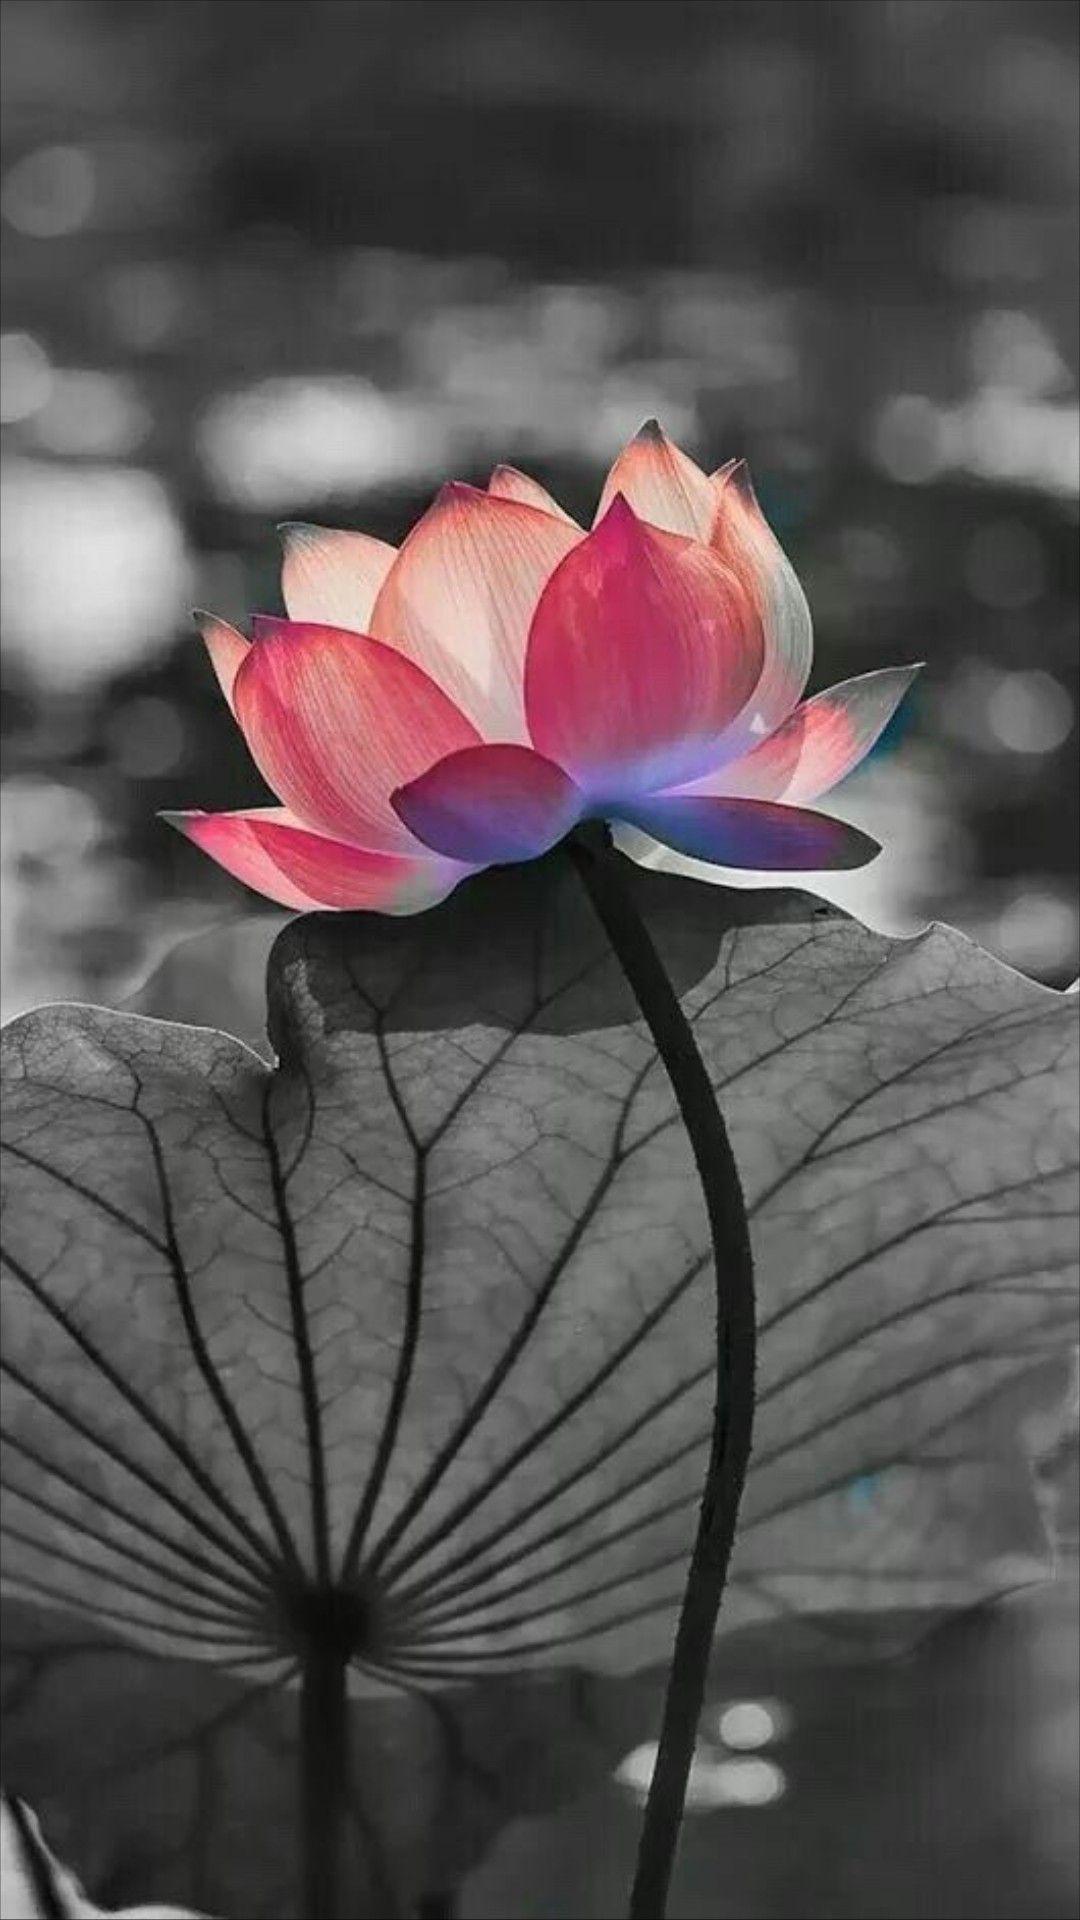 Pin by ml chiu on lotus pinterest lotus flowers and water lilies lotus izmirmasajfo